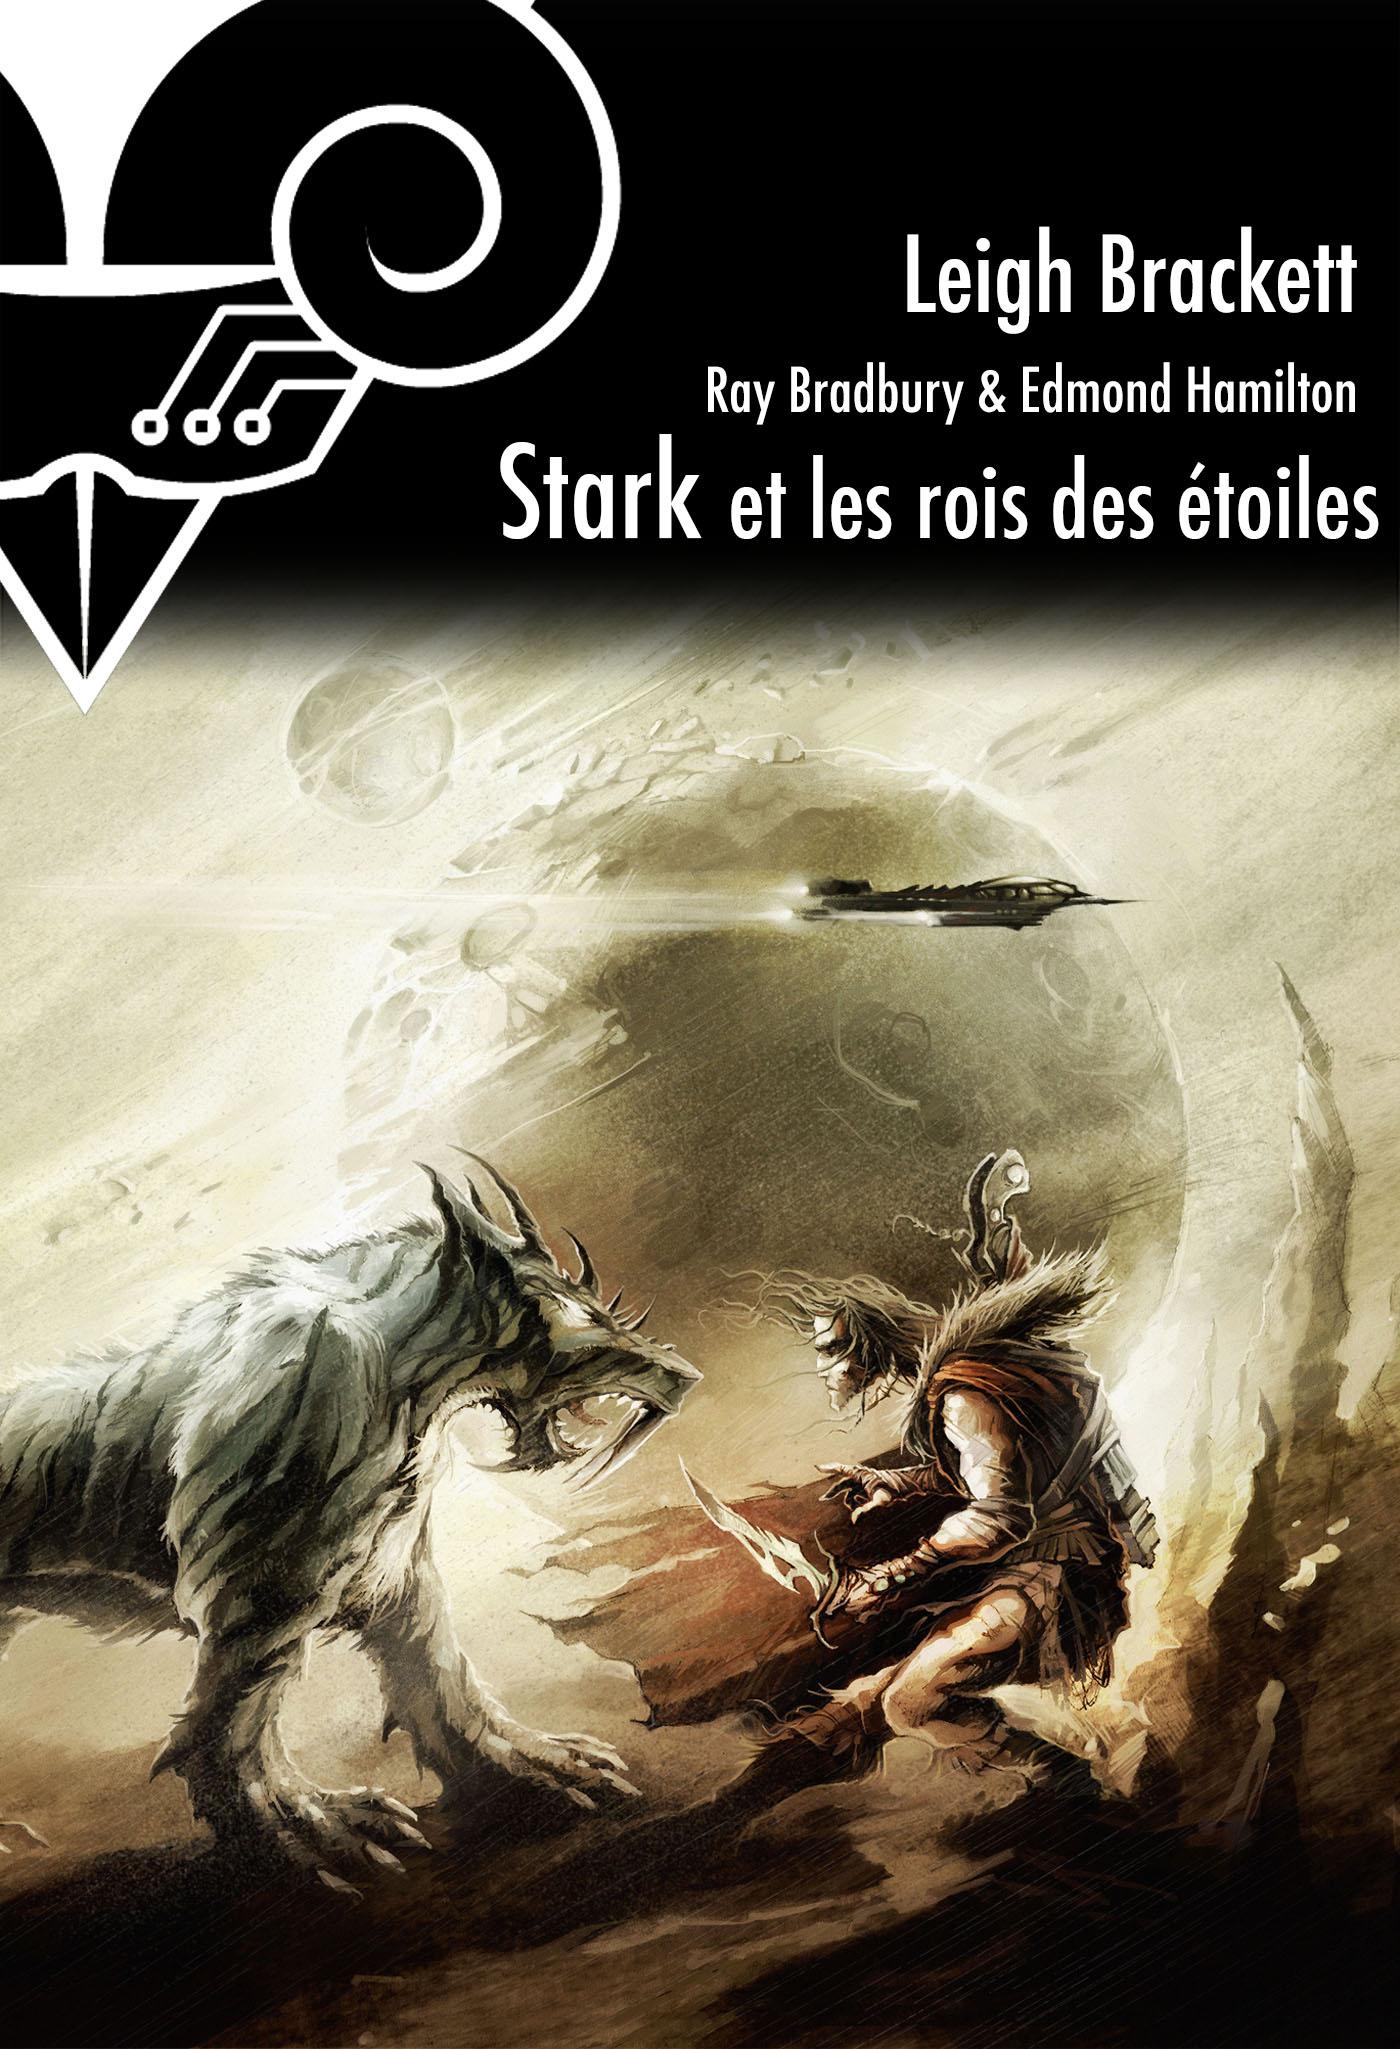 pdf nouvelles en francais de leigh brackett